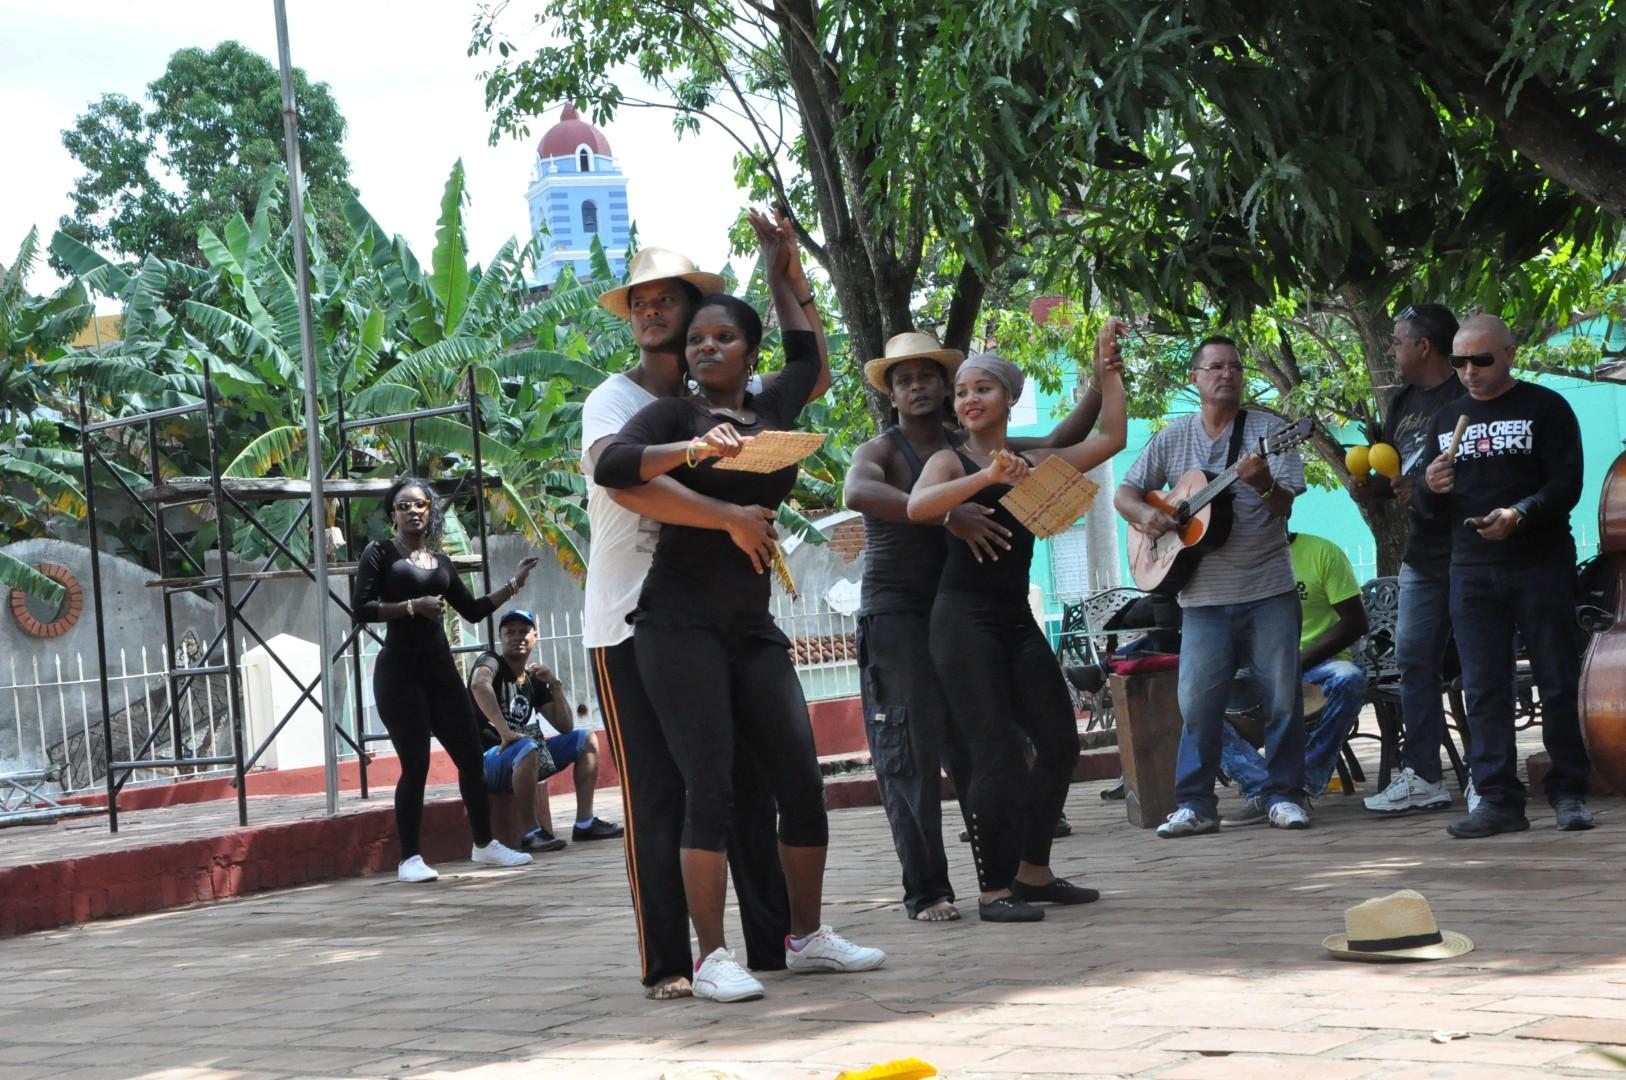 Sancti Spíritus, Sancti Spíritus en 26, Cuba, cultura